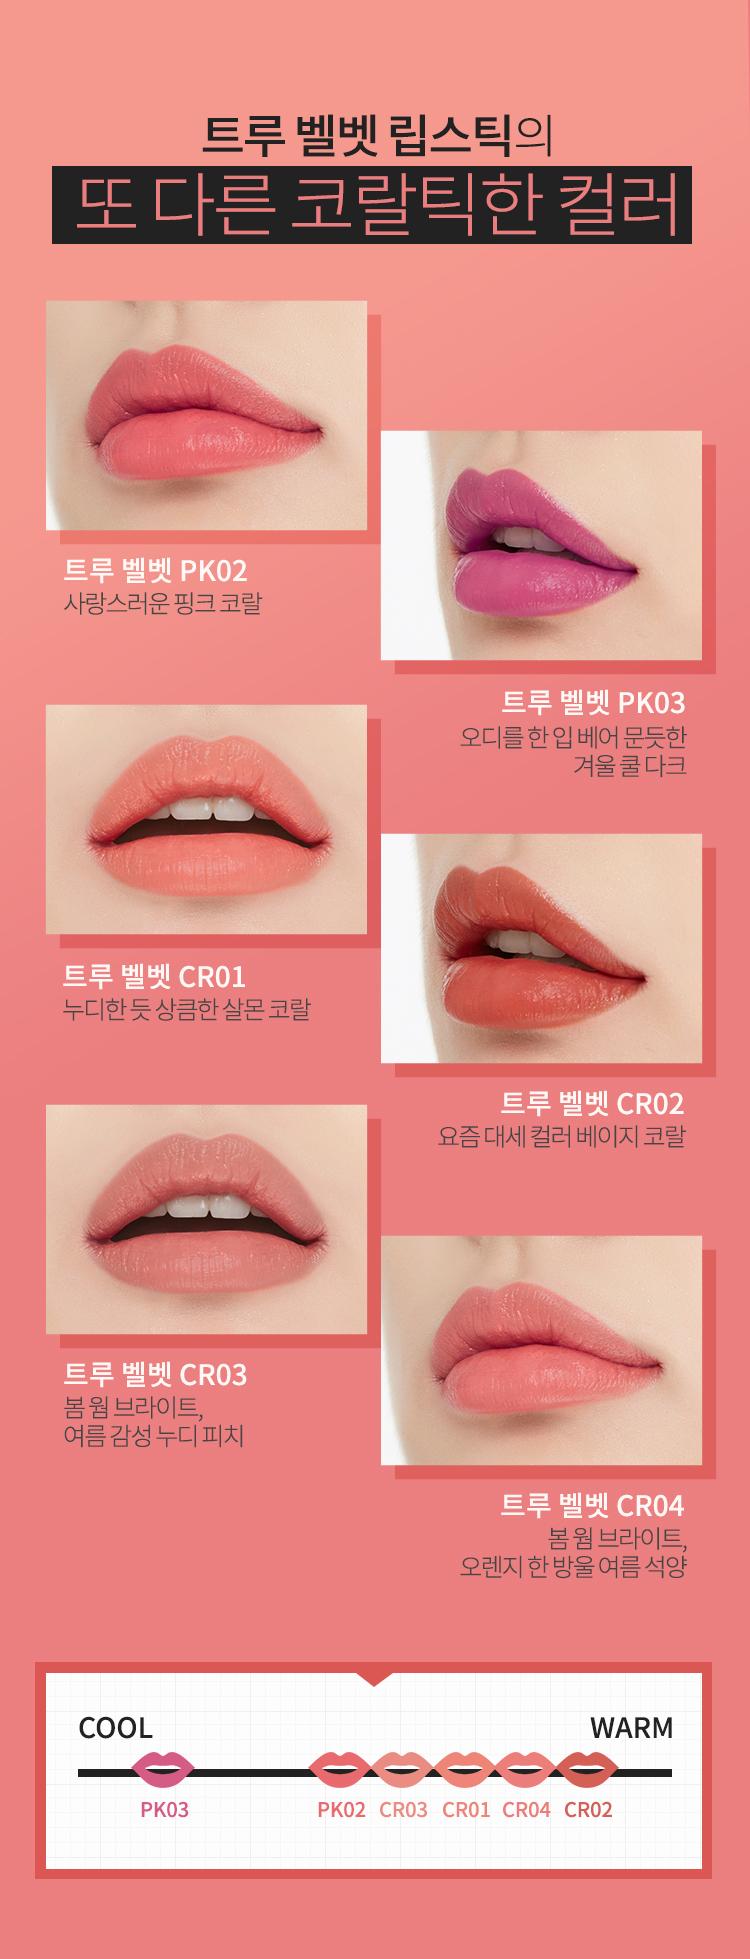 APIEU_True_Velvet_Lipstick_CR03CR04PK03_03.jpg